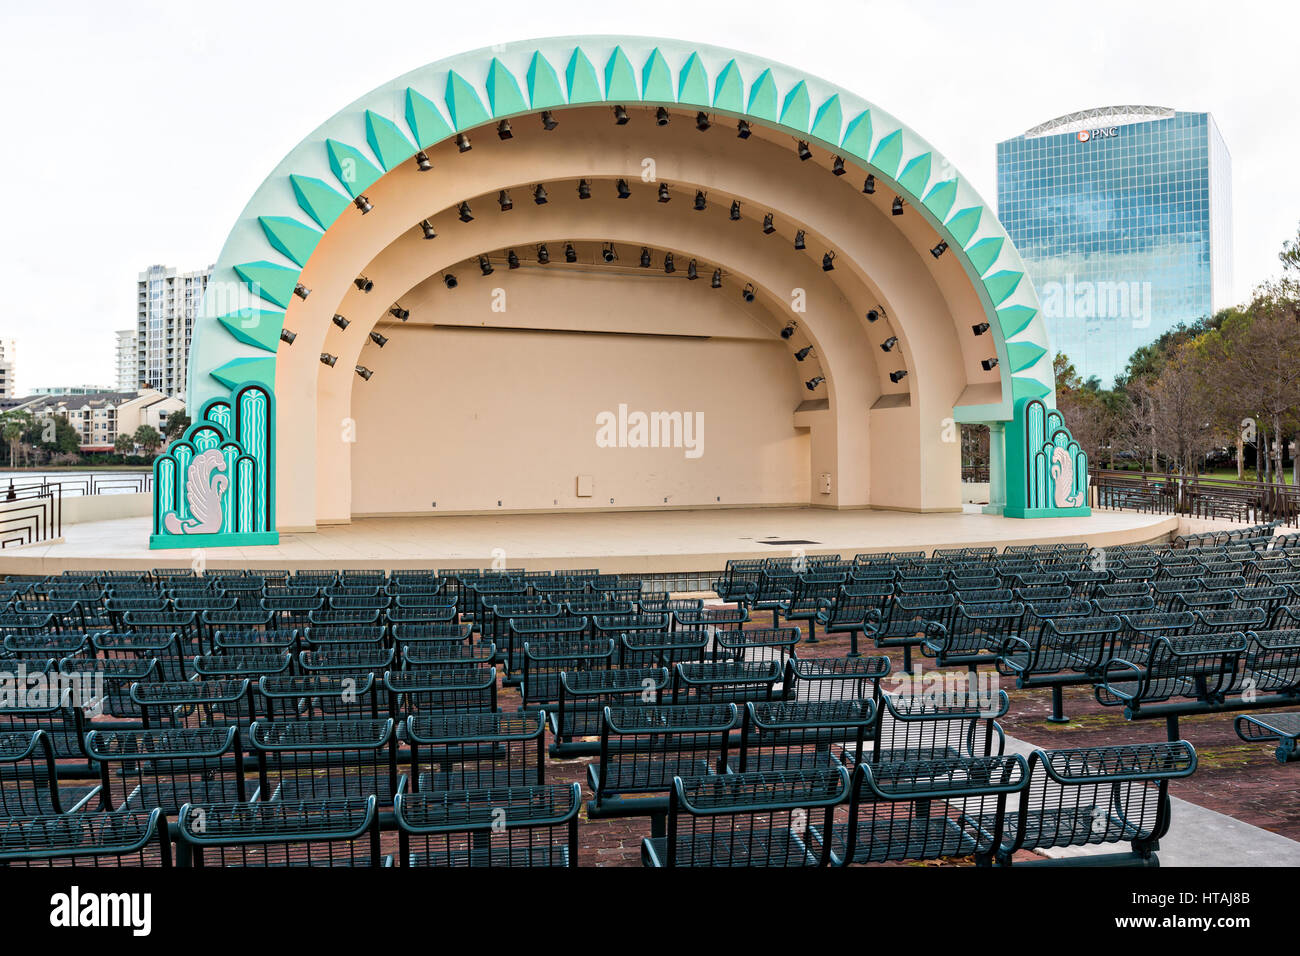 The Historic Walt Disney Amphitheater At Lake Eola Park In Orlando